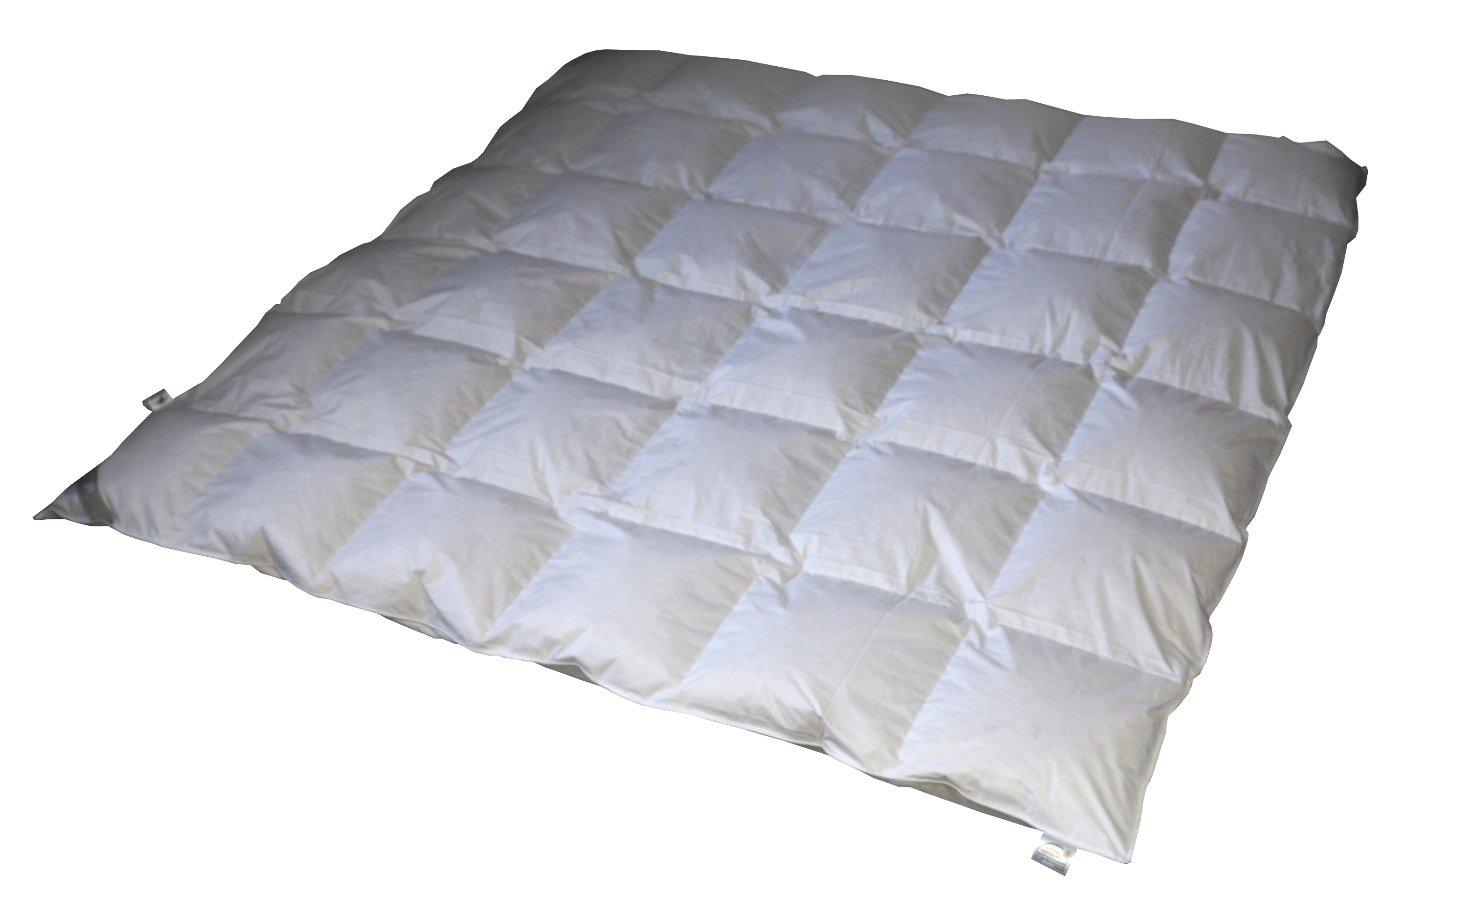 Betten Hofmann Kuscheliges Daunenbett Daunendecke 6x7 240x220 cm warme Ganzjahresdecke